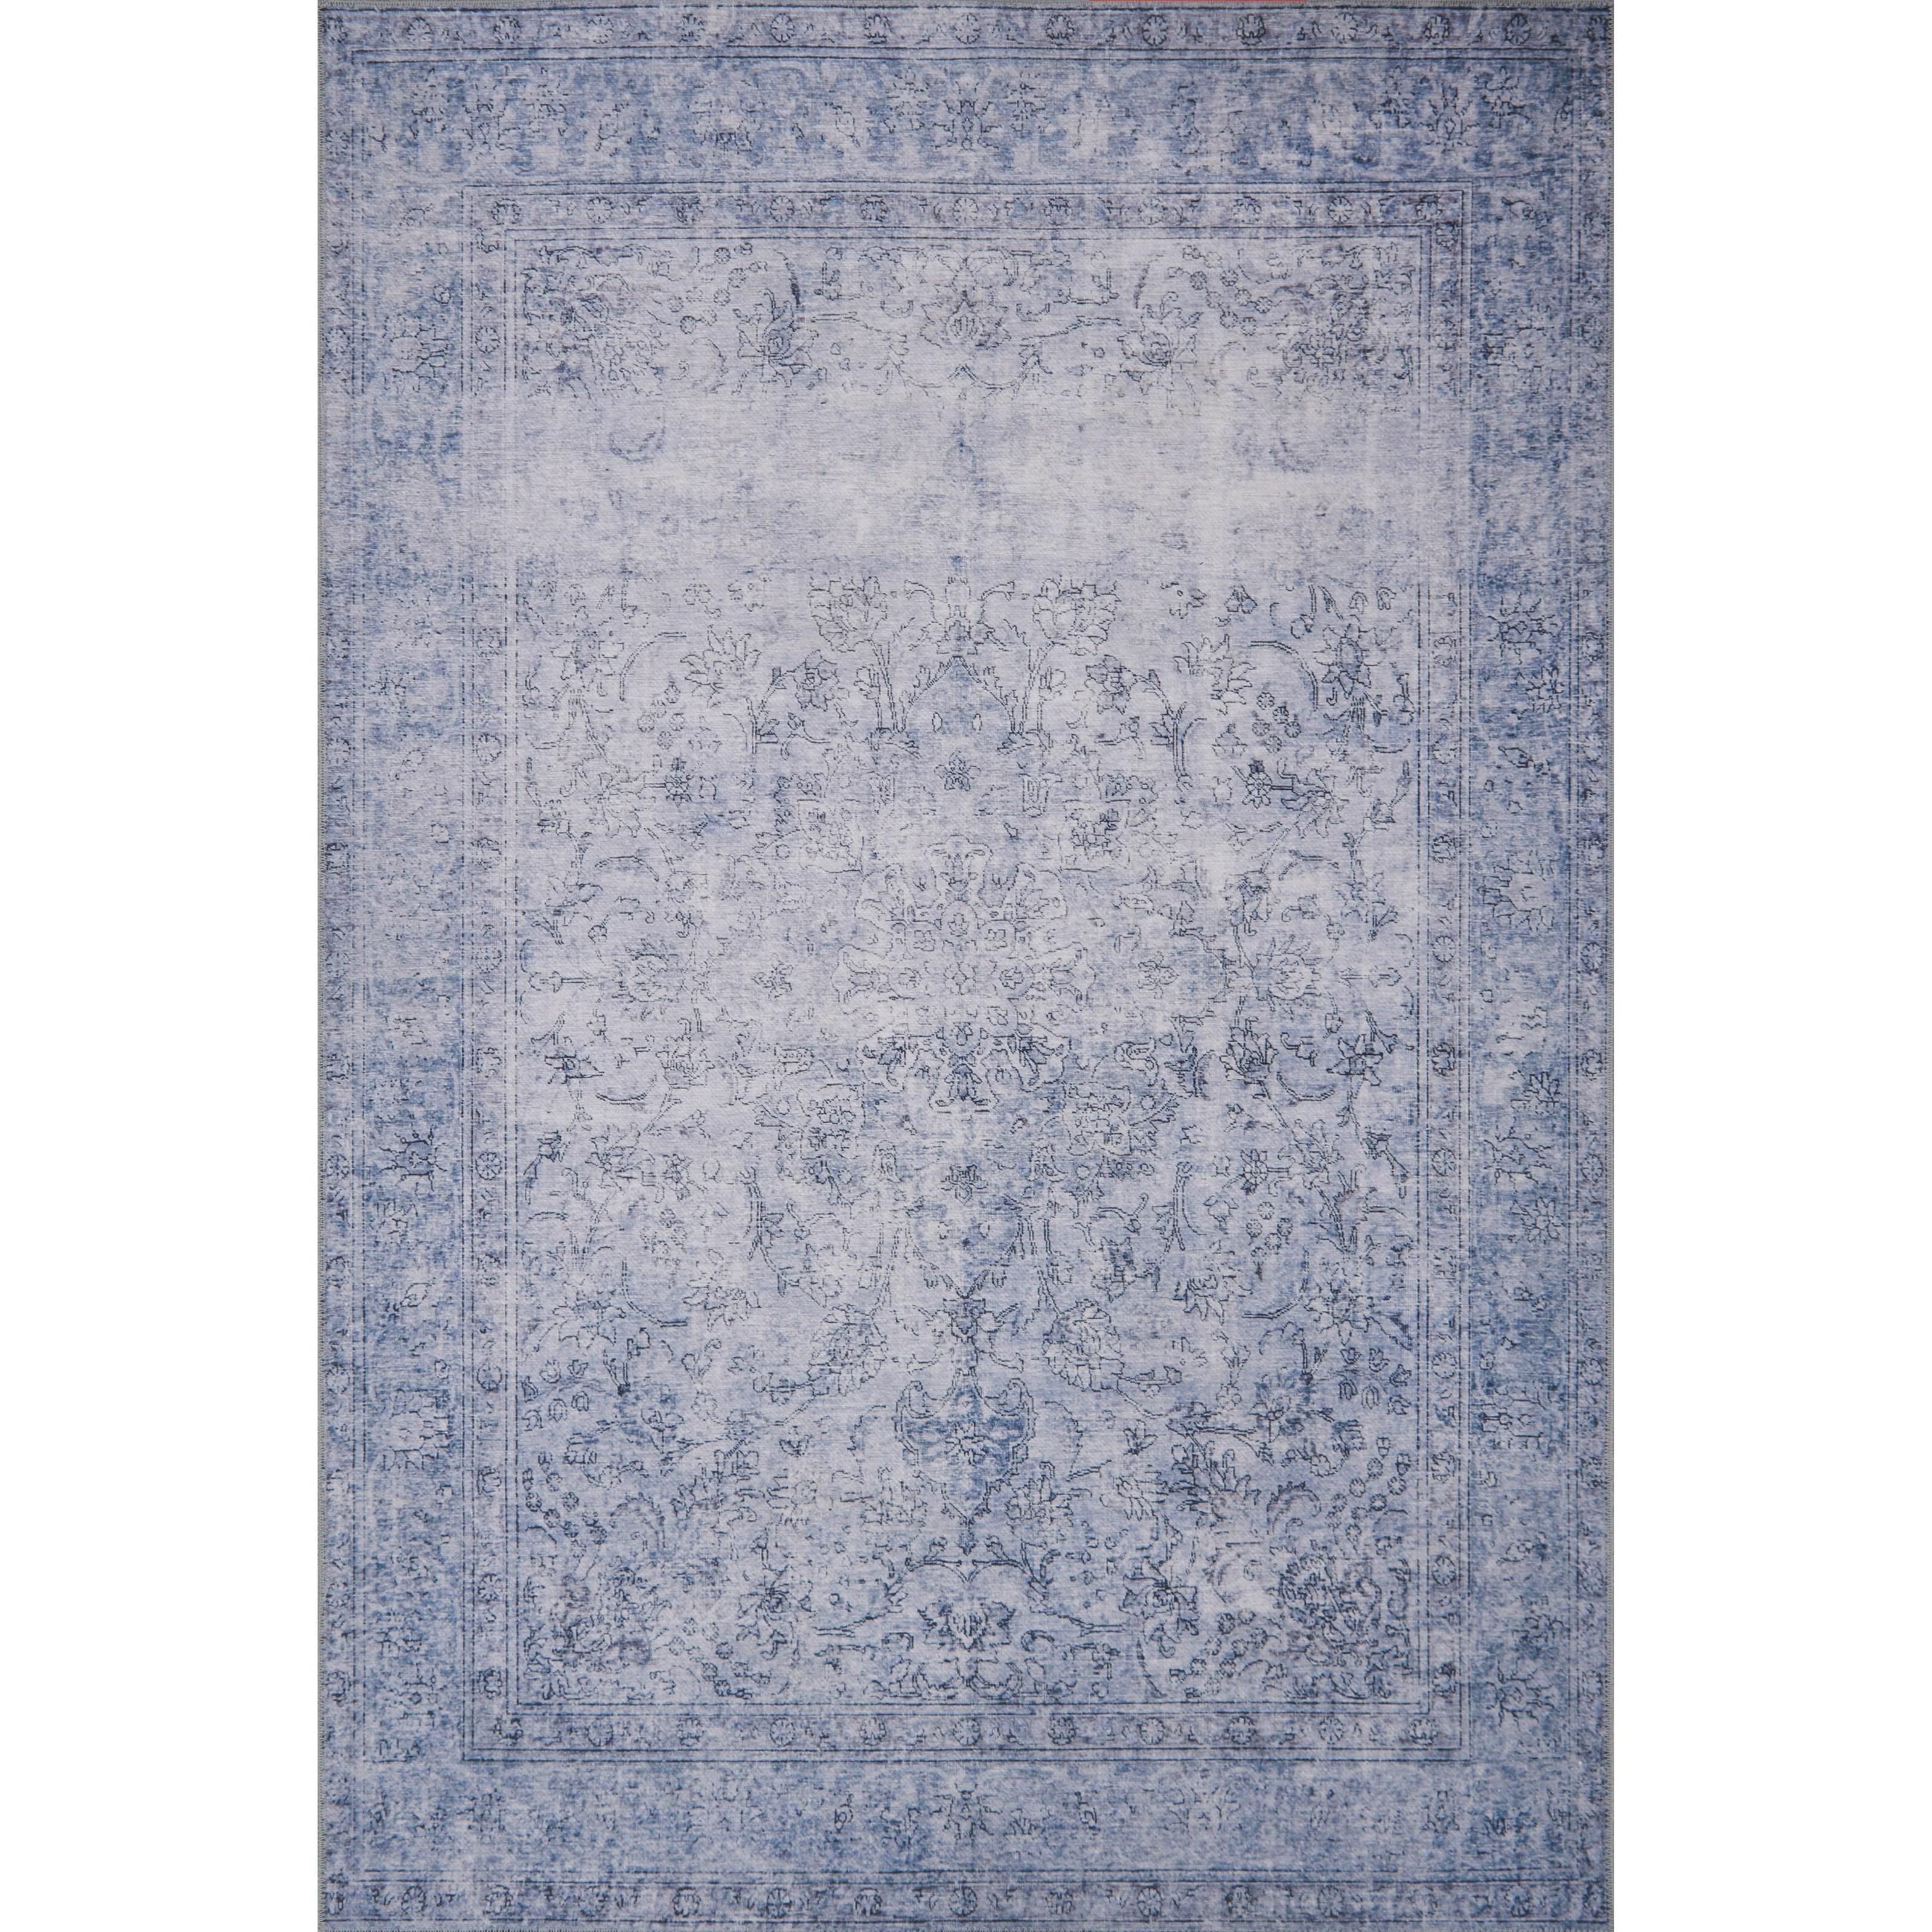 "Loren 8'4"" x 11'6"" Slate Rug by Loloi Rugs at Virginia Furniture Market"